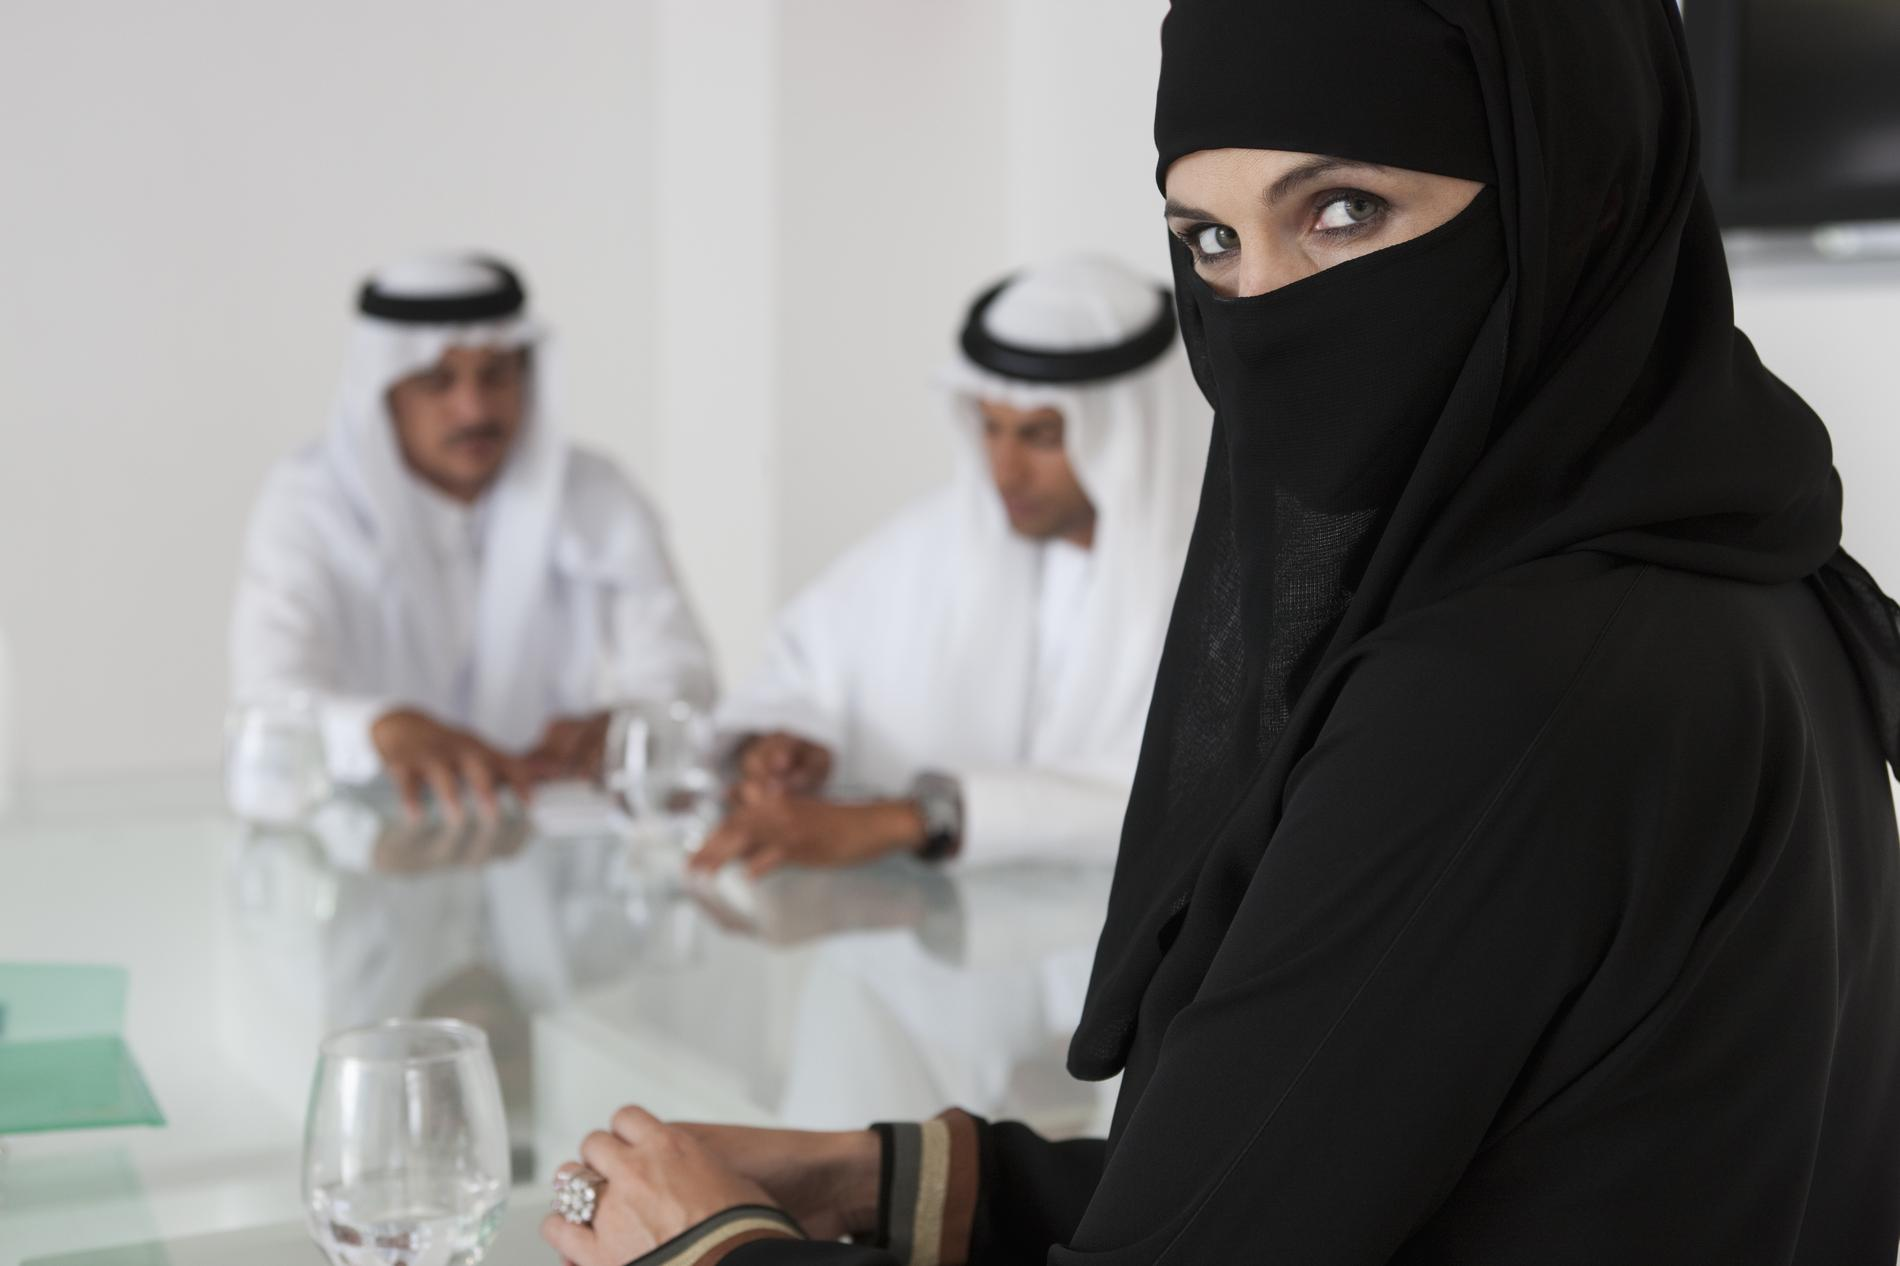 Recherche femmes divorcées